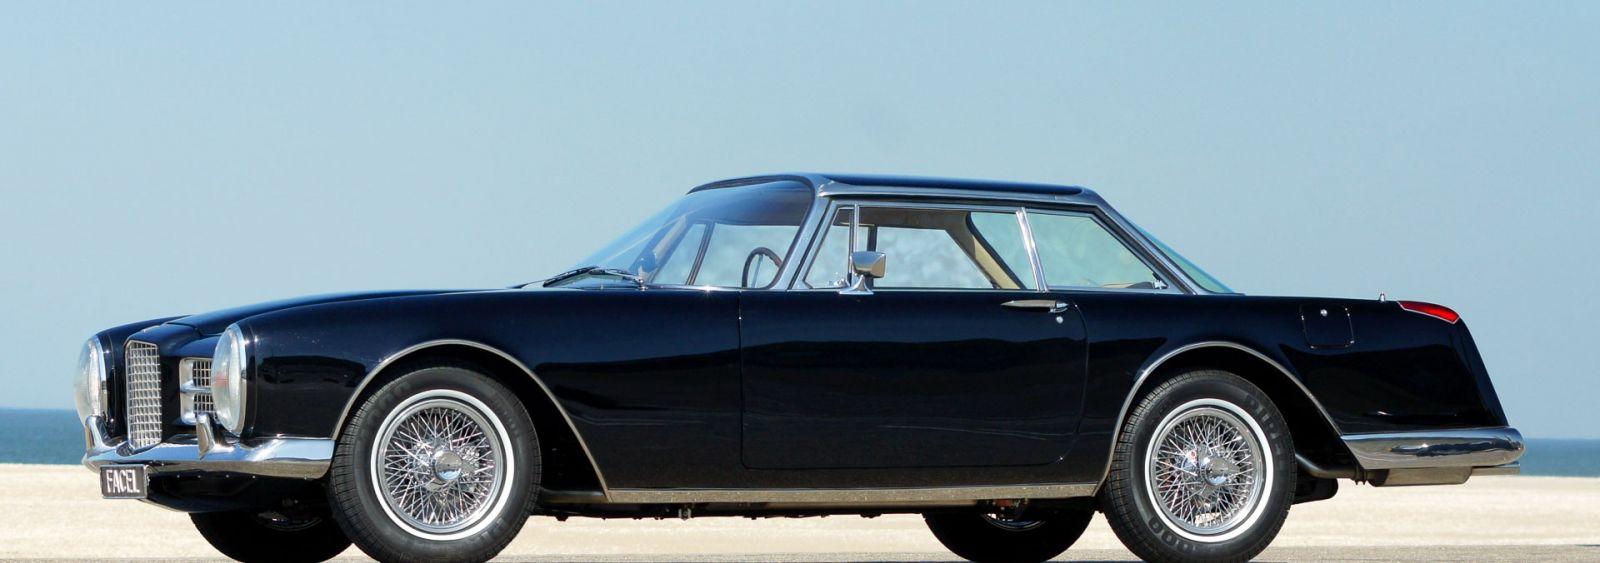 Car Garage For Sale >> Facel Vega Facel II, 1964 - Welcome to ClassiCarGarage